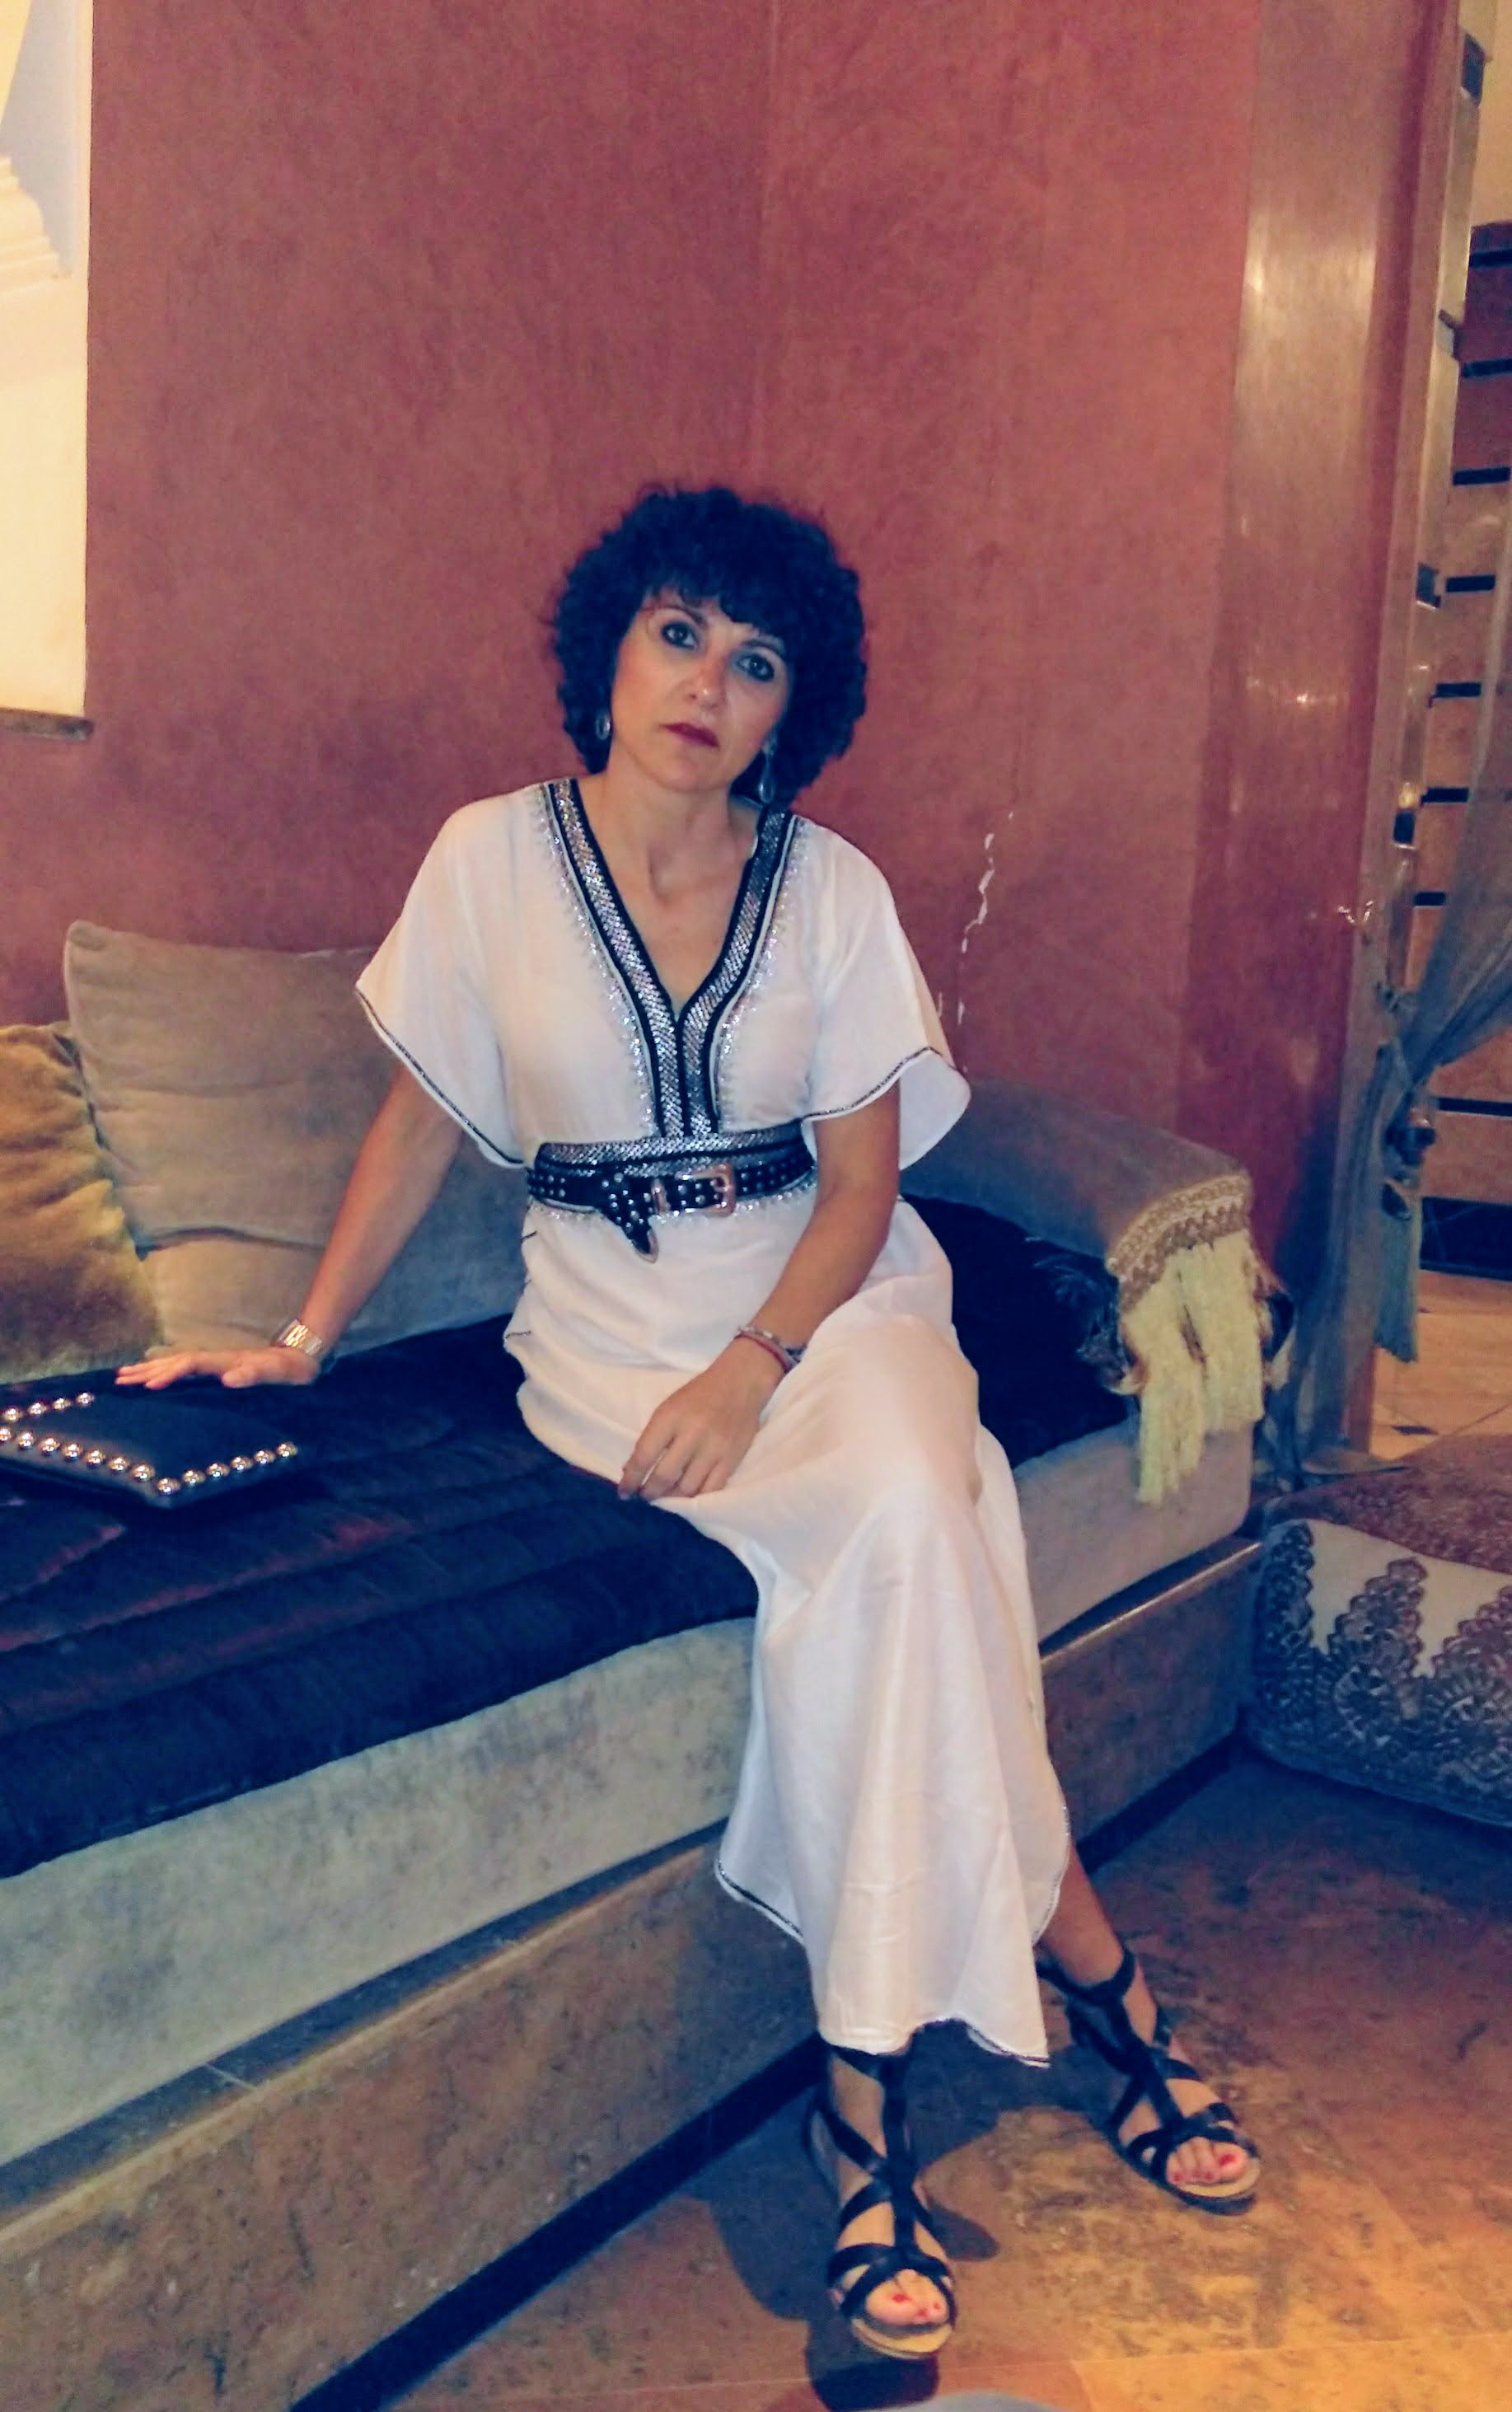 Miss Clov, Rebeca Valdivia, personal shopper, travel, trip, Moroco, Sahara, Atlas, Marrueco, desierto del Sahara, desert, Marrakech, hotel